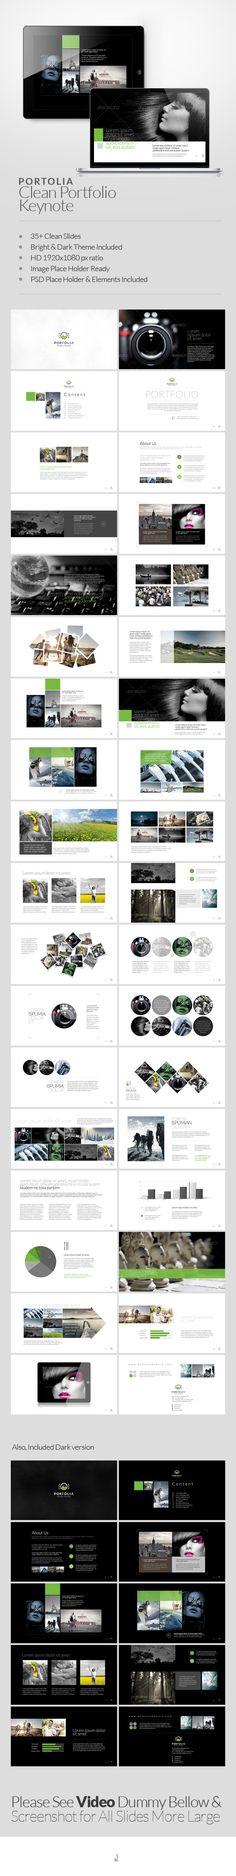 Portolia Multipurpose Clean Portfolio Keynote — Keynote KEY #professional #plan • Available here → https://graphicriver.net/item/portolia-multipurpose-clean-portfolio-keynote/6452302?ref=pxcr